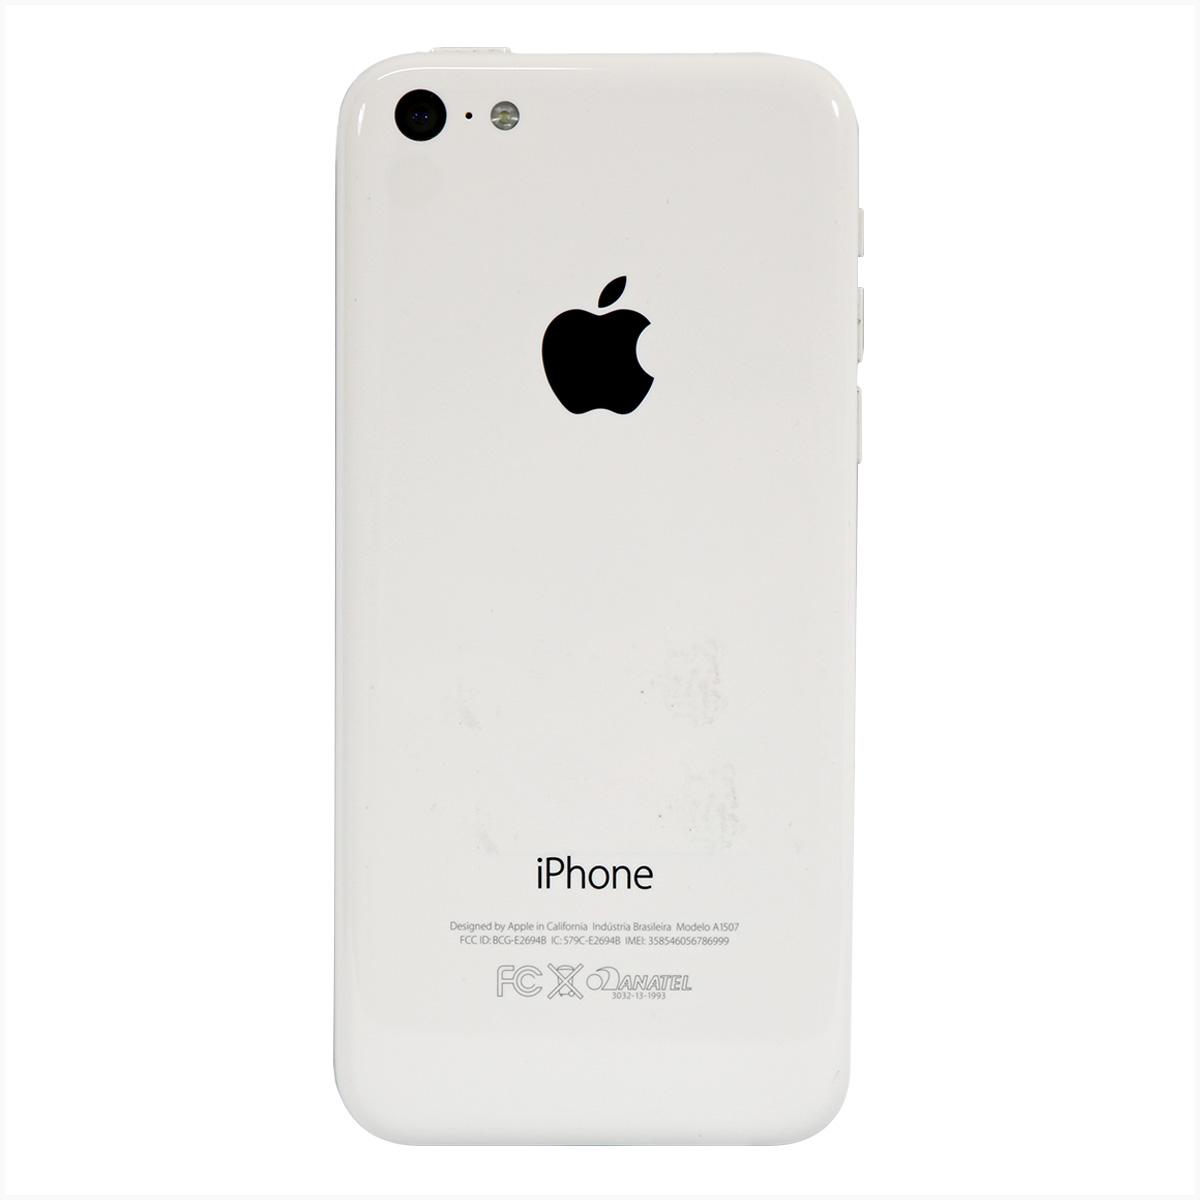 Iphone 5c a1507 16gb branco - usado